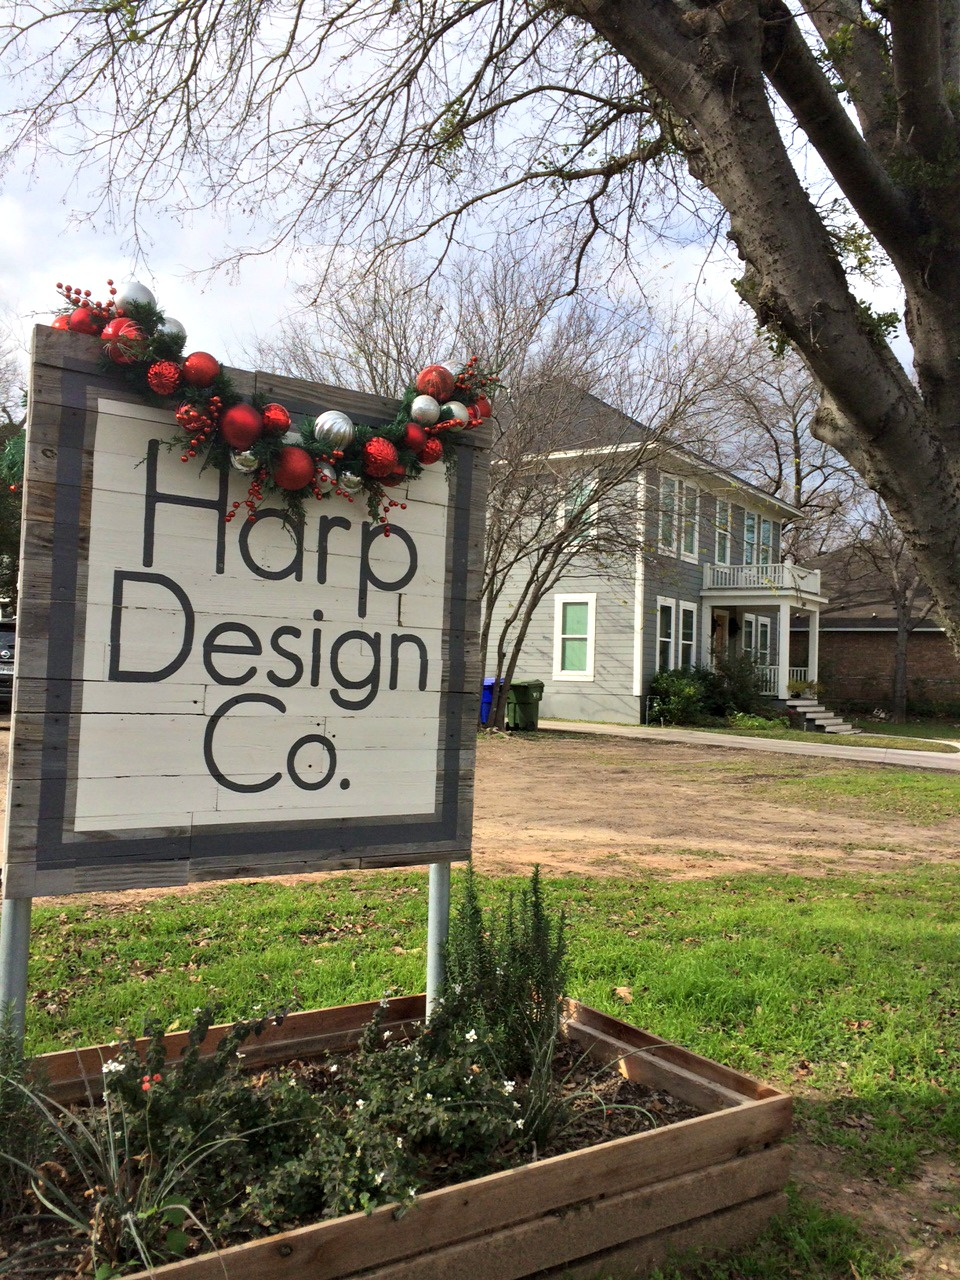 Magnolia Market Harp Design Co.